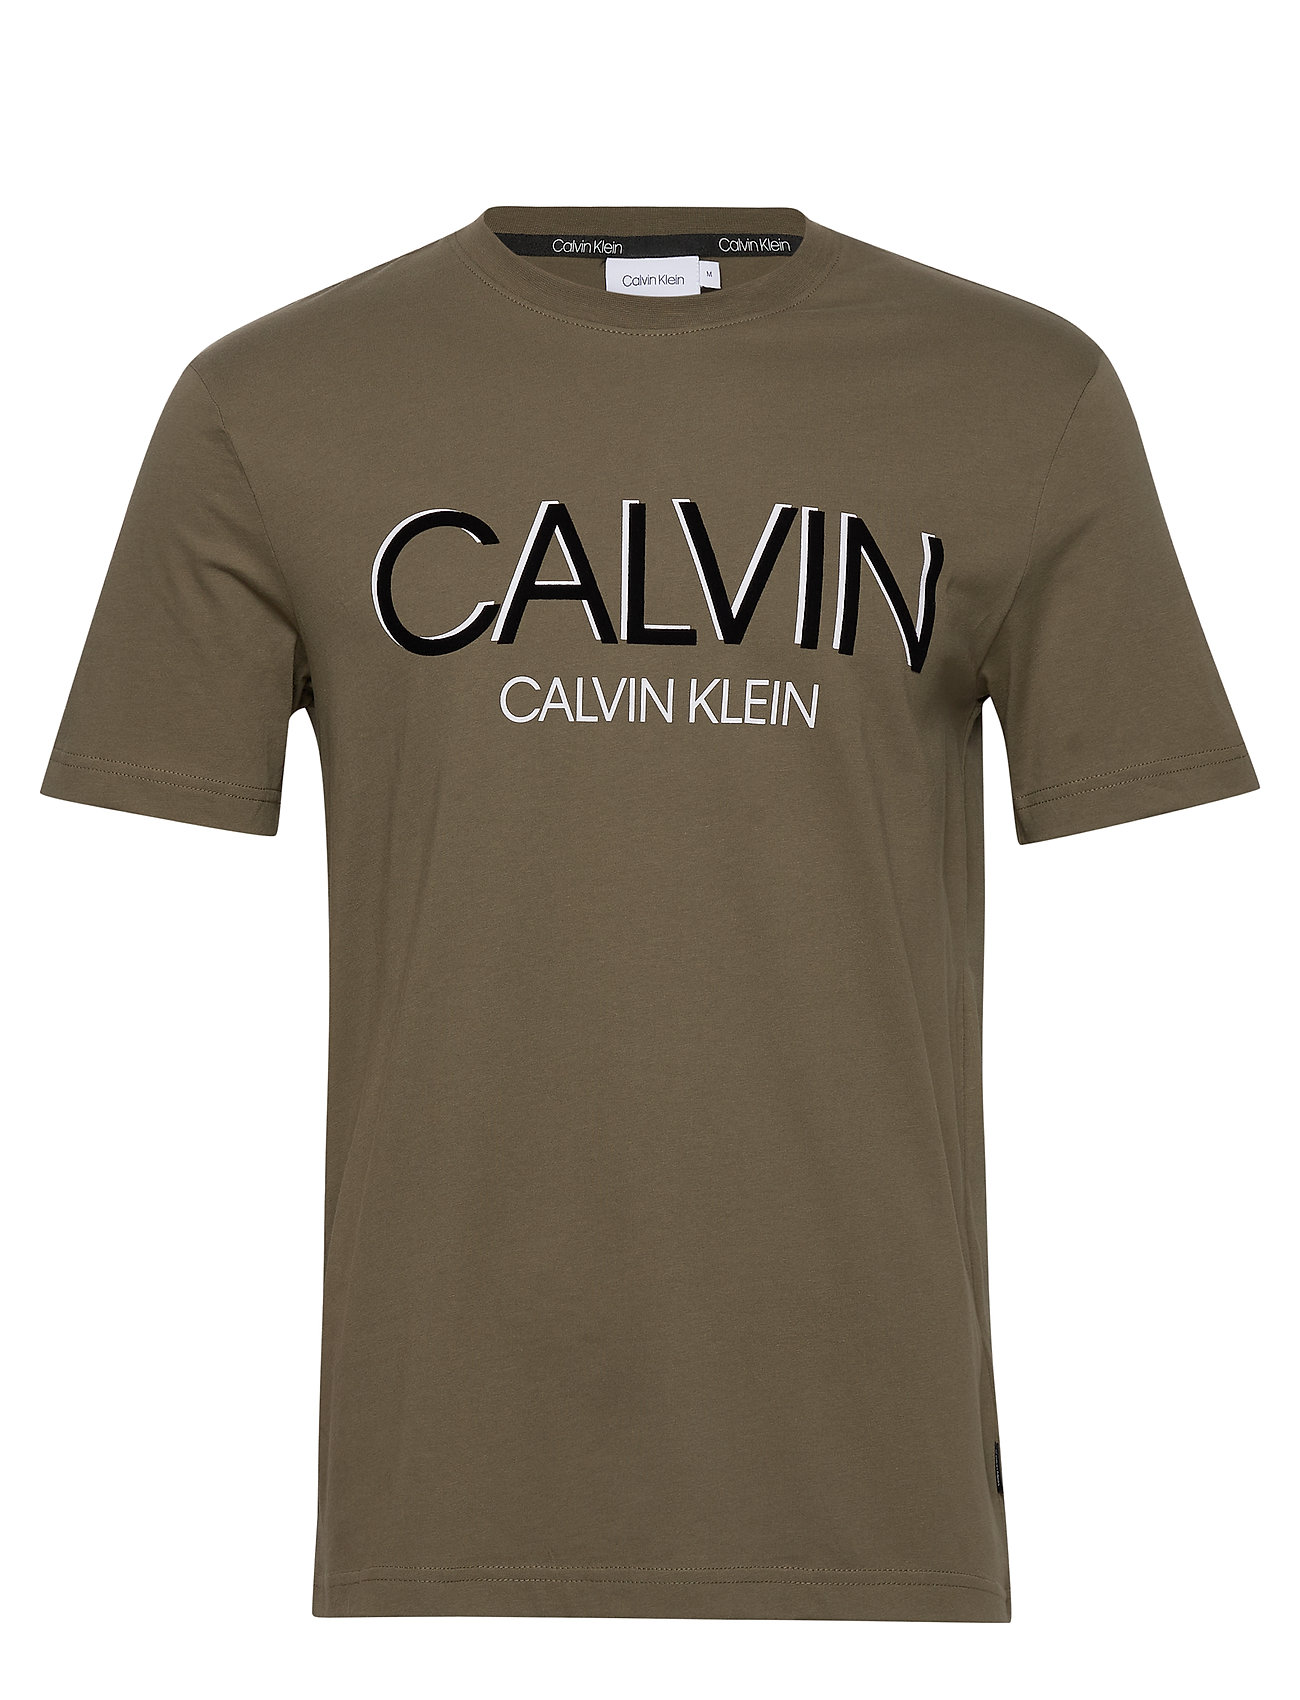 Image of Calvin Shadow Logo T-Shirt T-shirt Grøn Calvin Klein (3411339047)